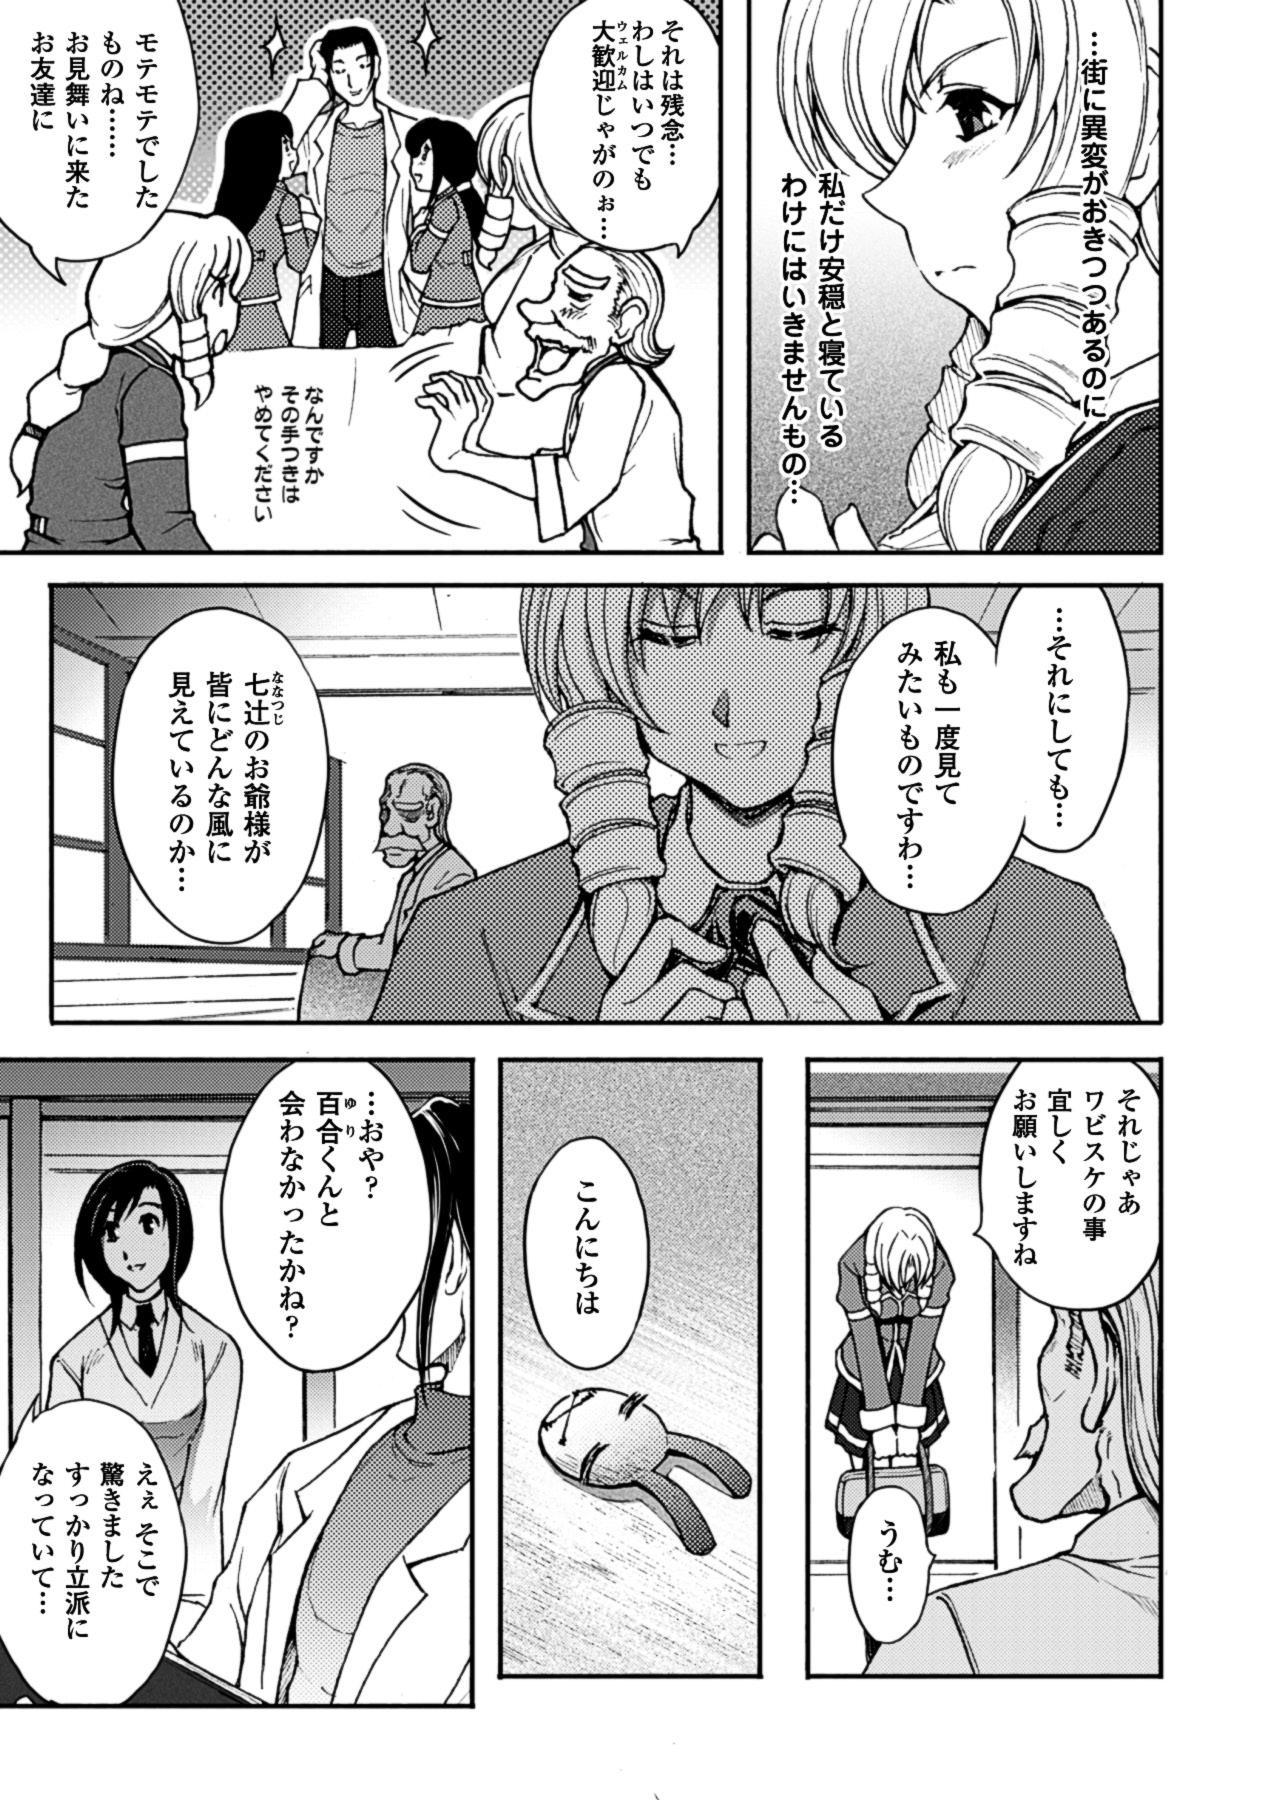 Megami Crisis 10 138